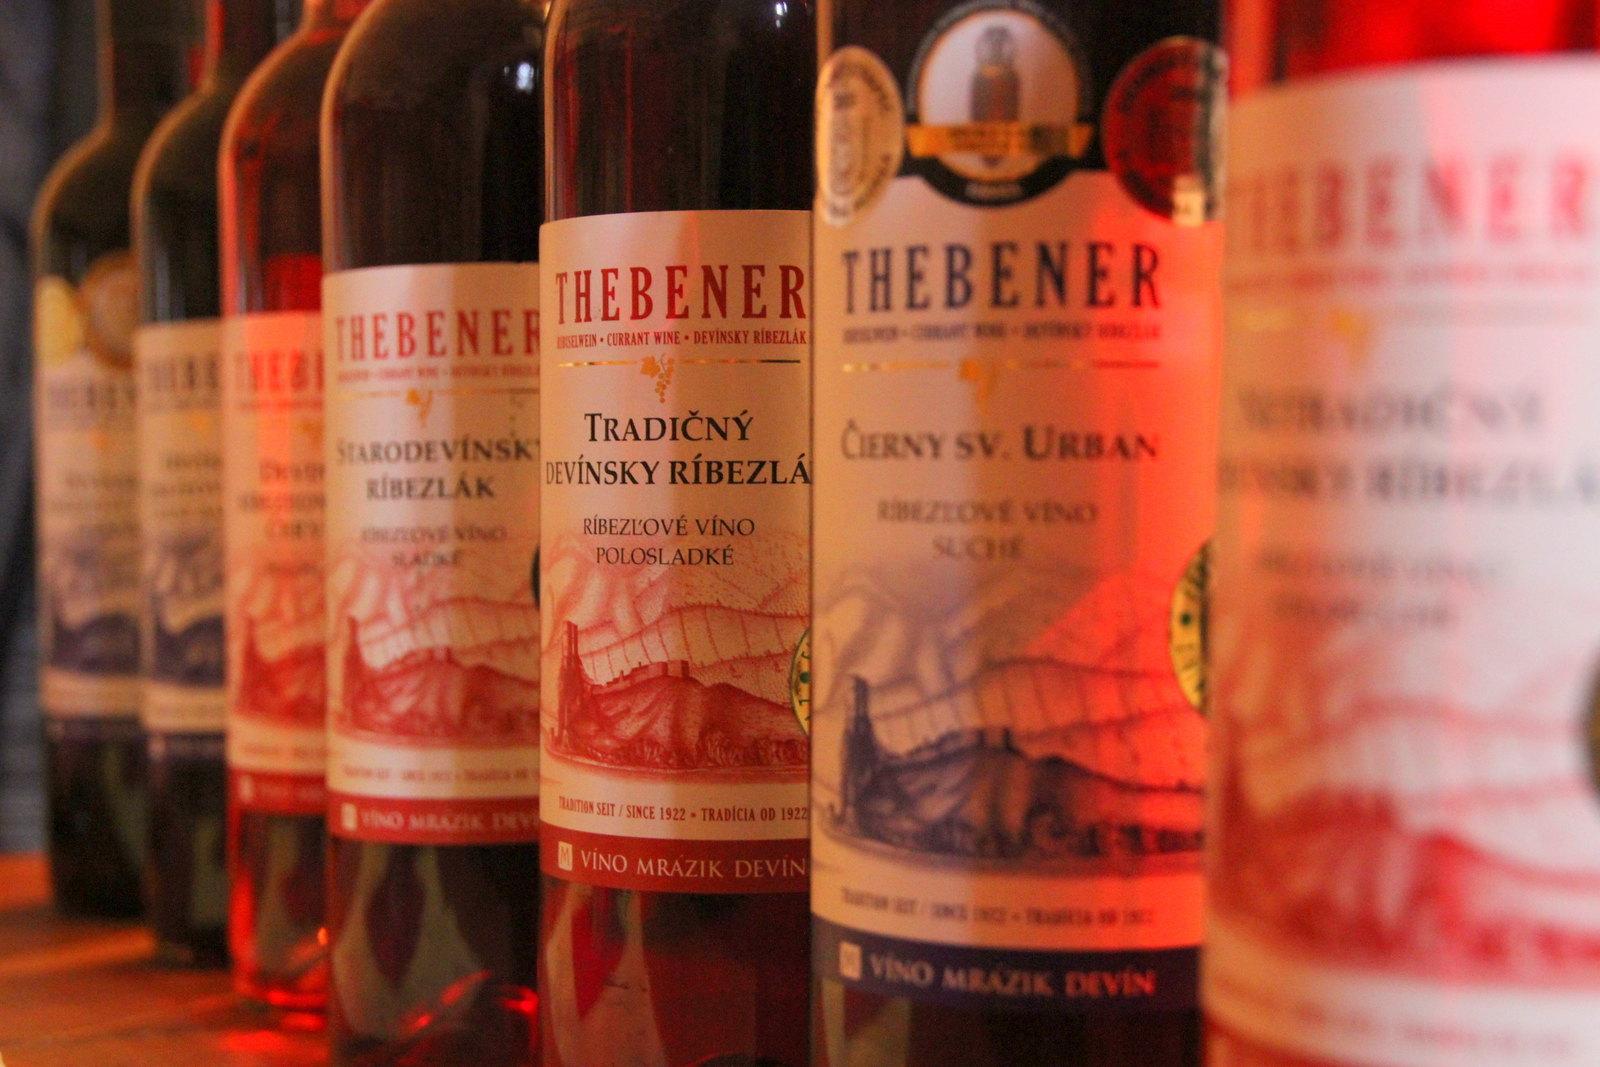 Thebener wines